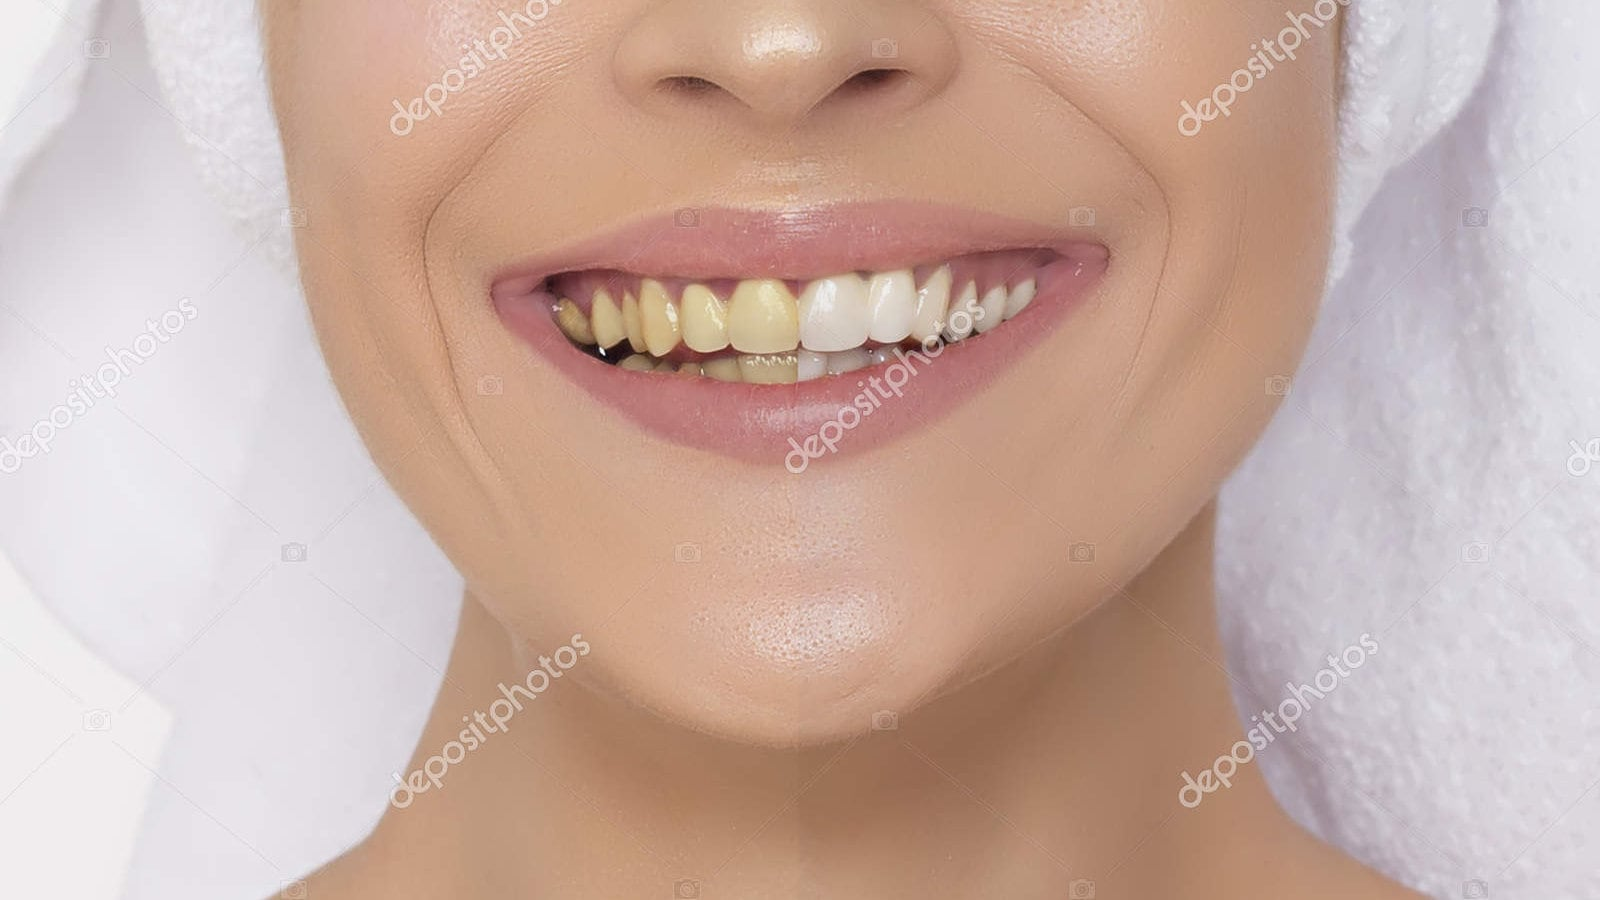 stained-teeth-sample